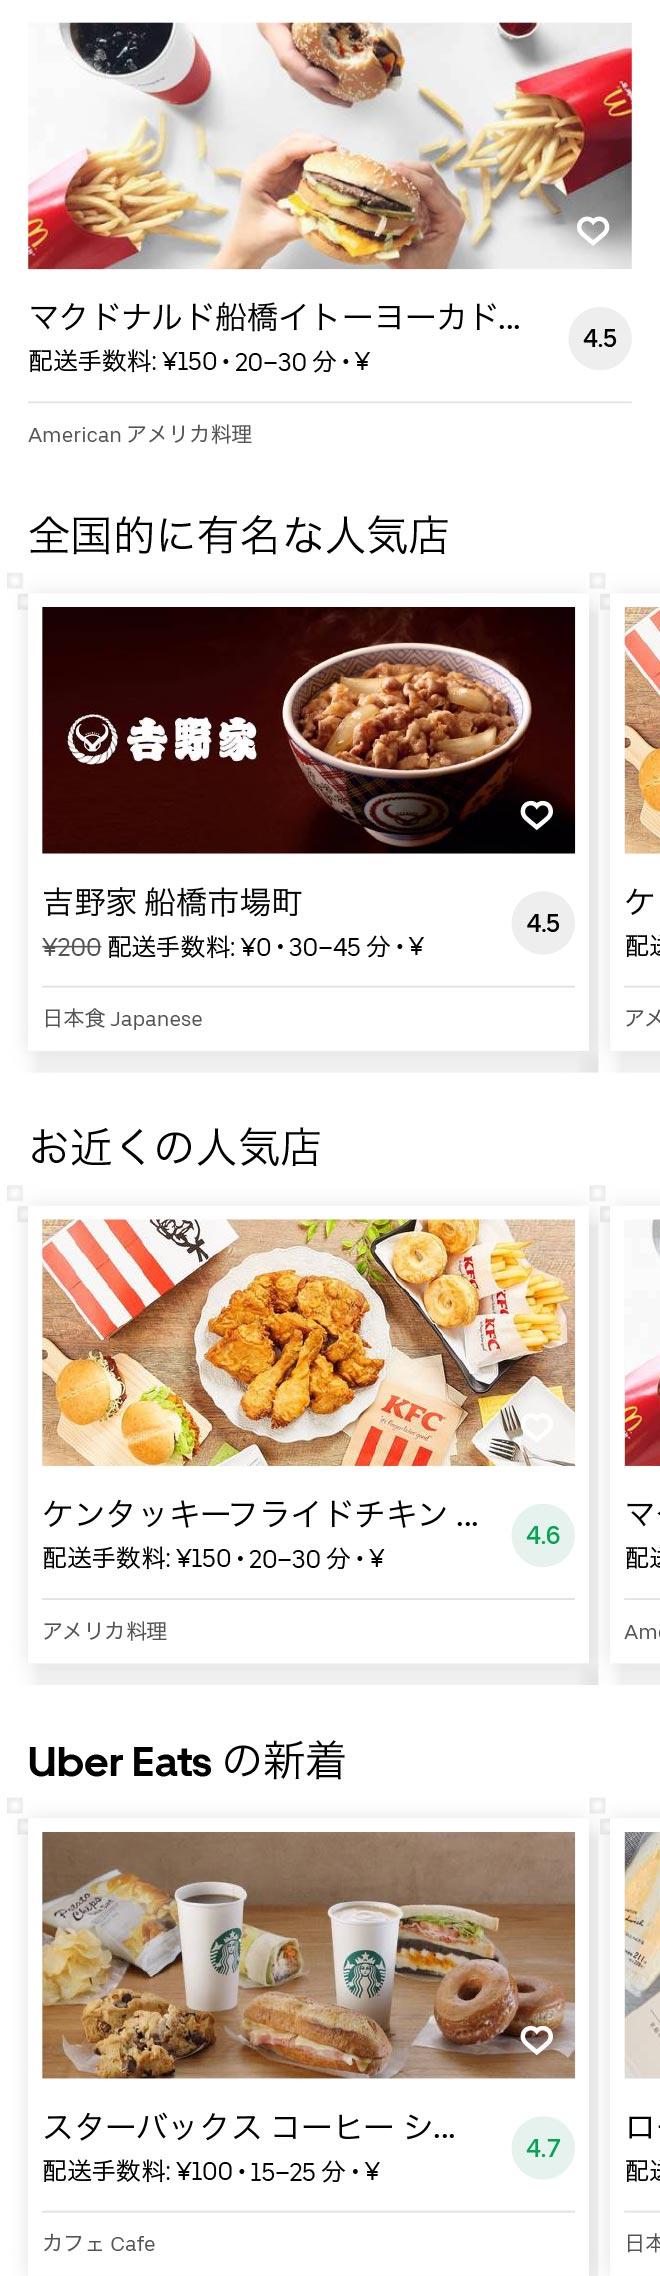 Funabashi menu 2008 01